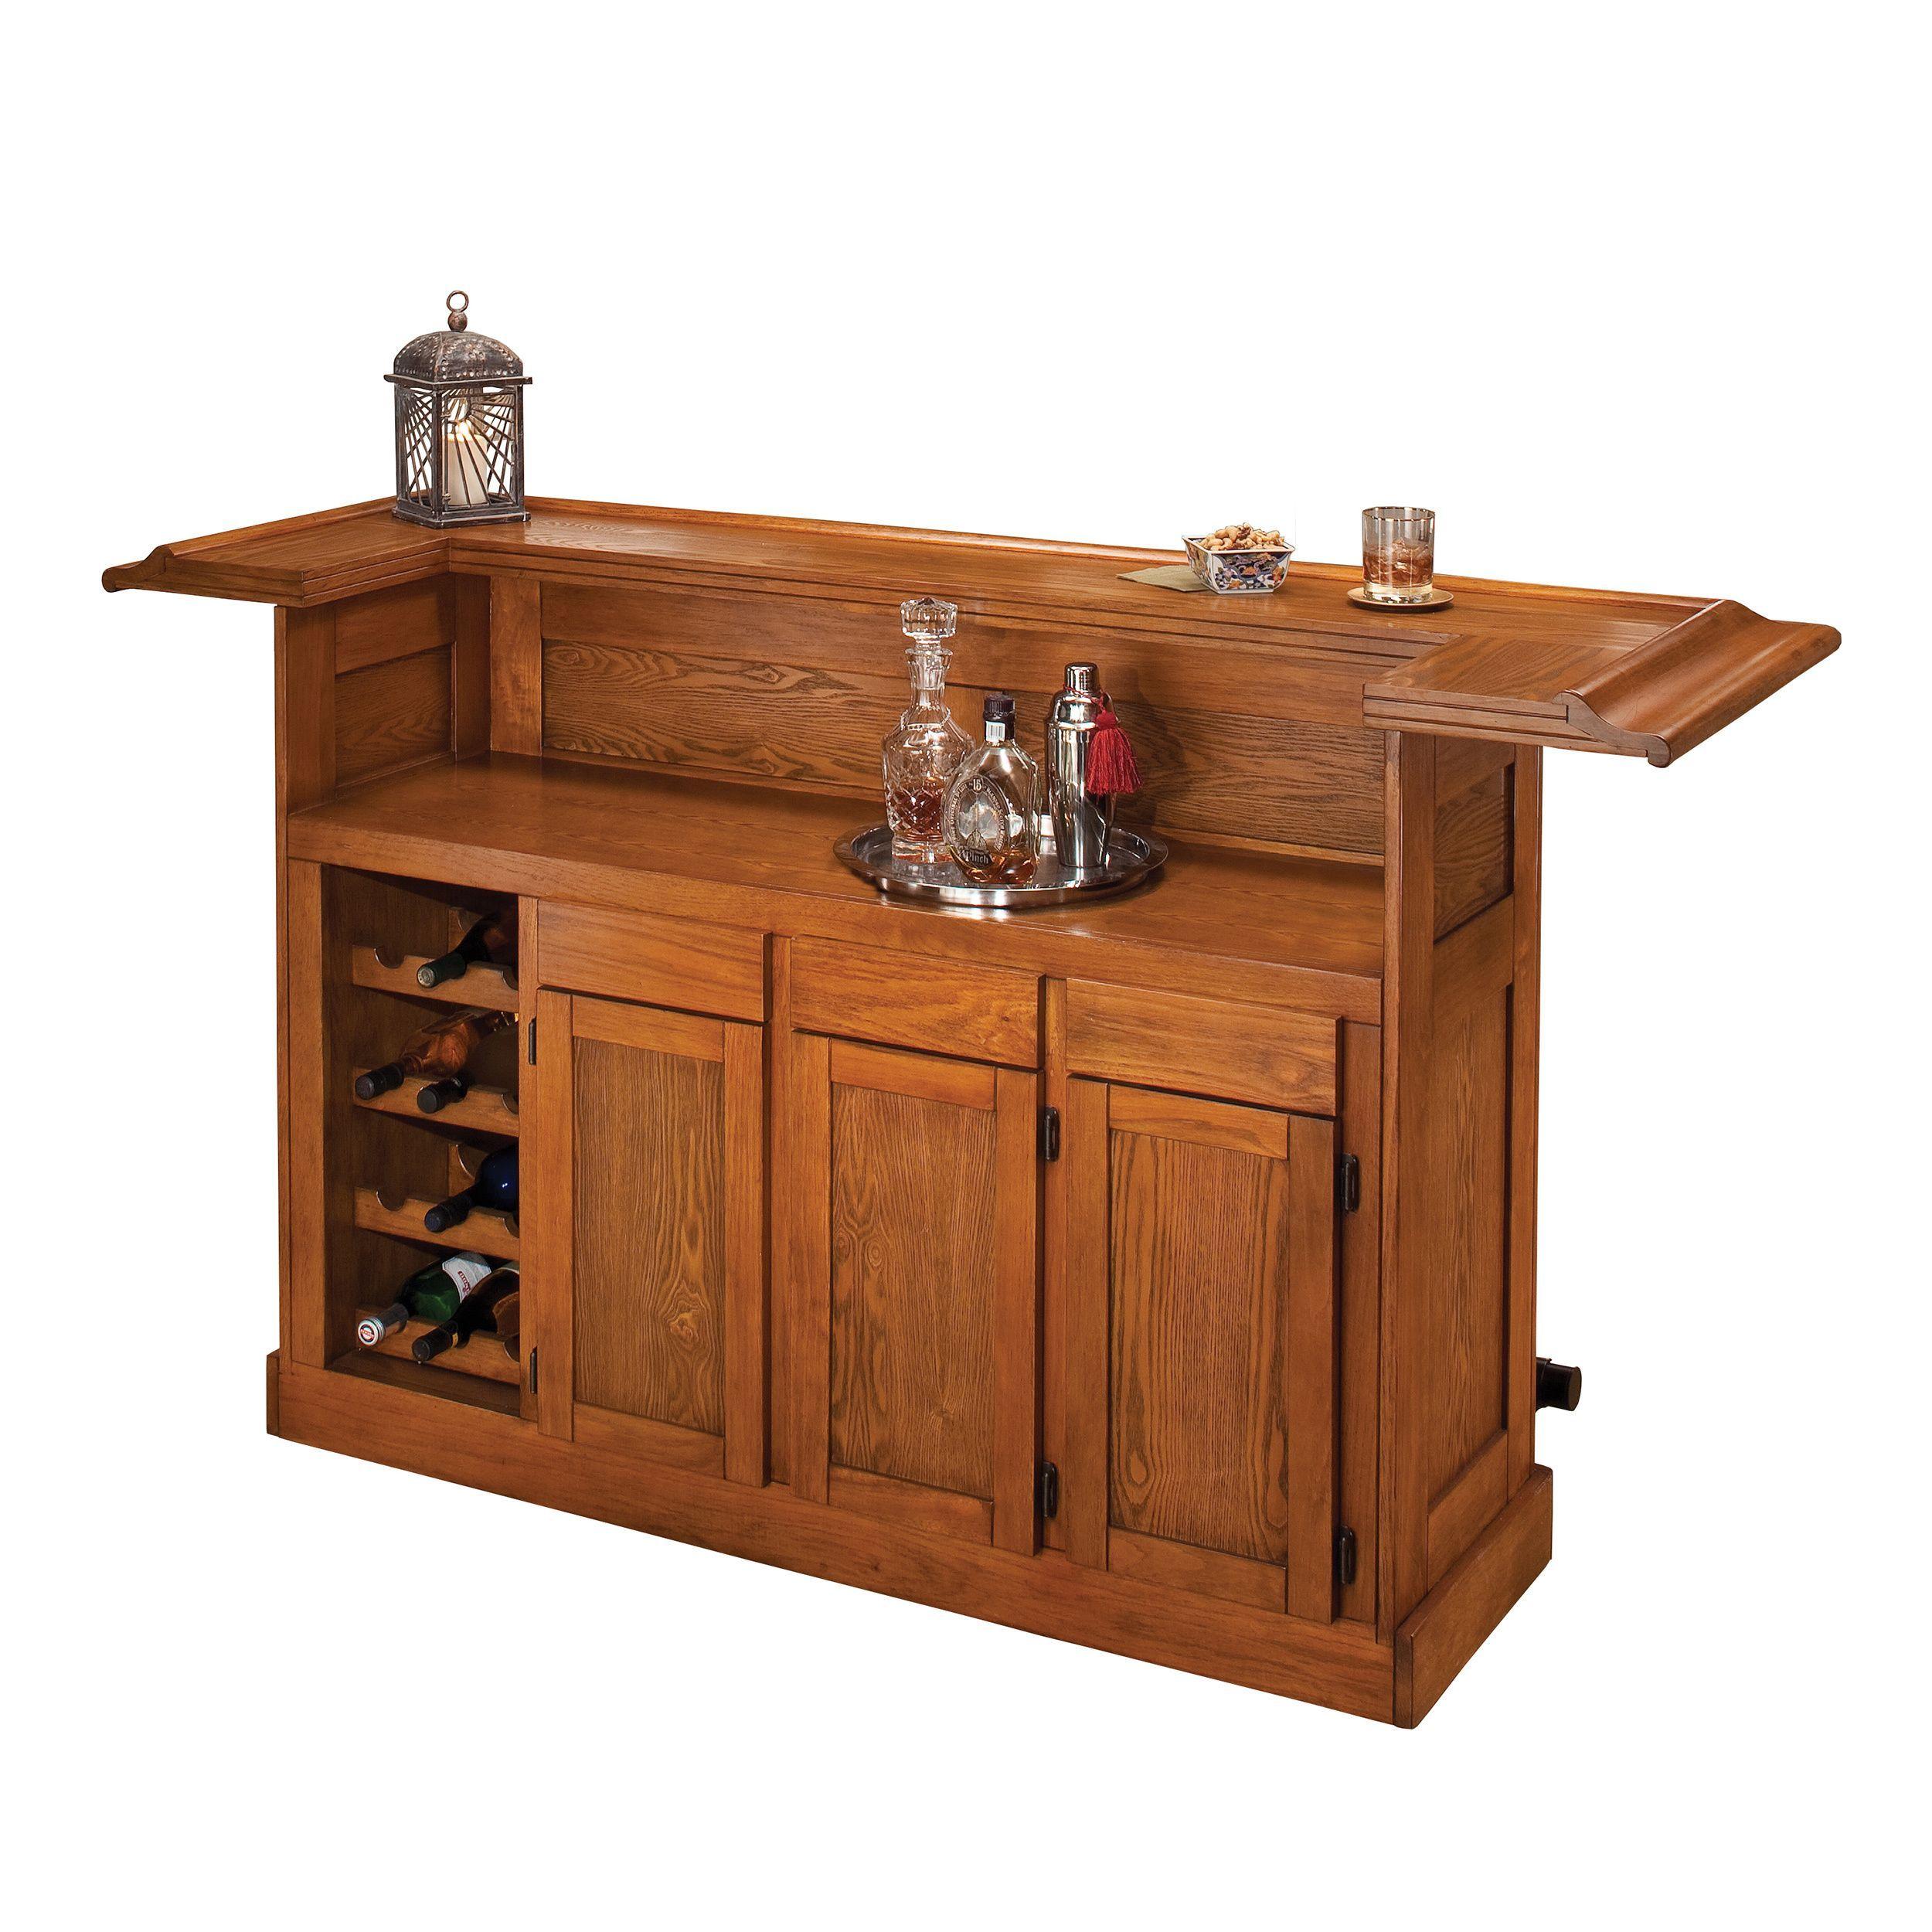 Hillsdale Classic Large Oak Home Bar (Oak), Brown   Pinterest